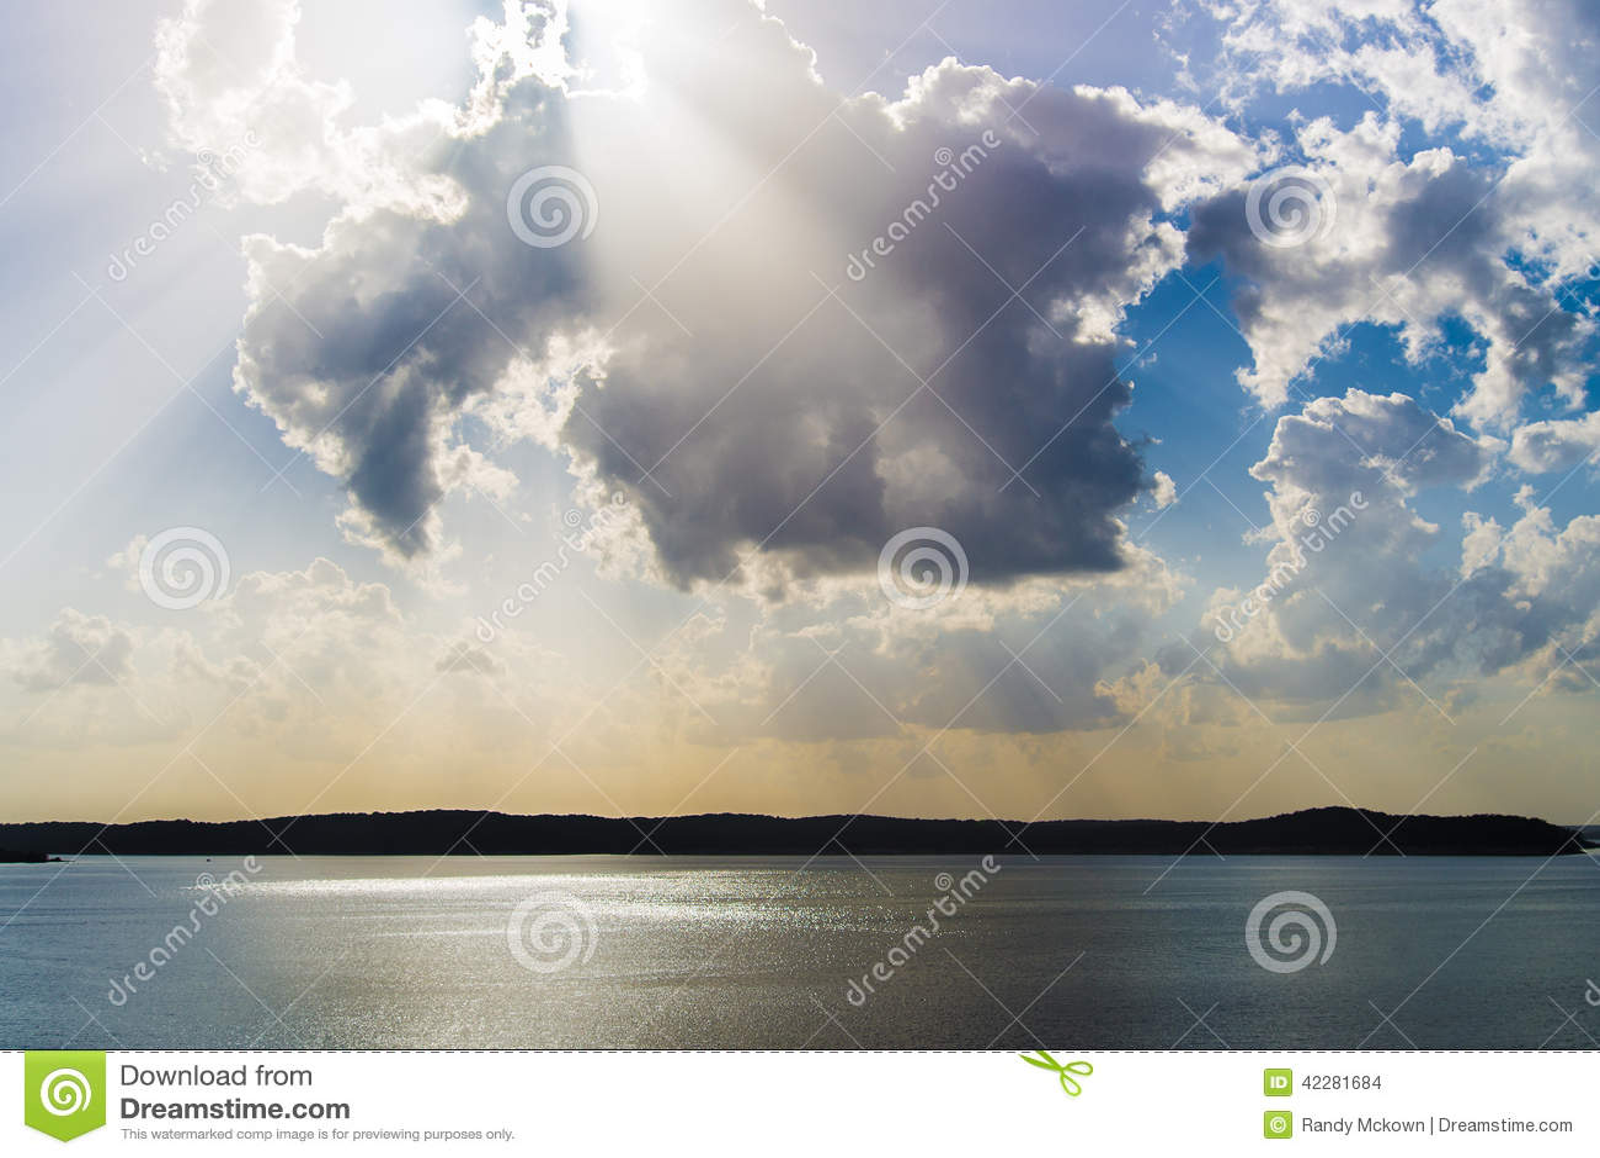 Raios claros do nascer do sol/por do sol sobre o lago